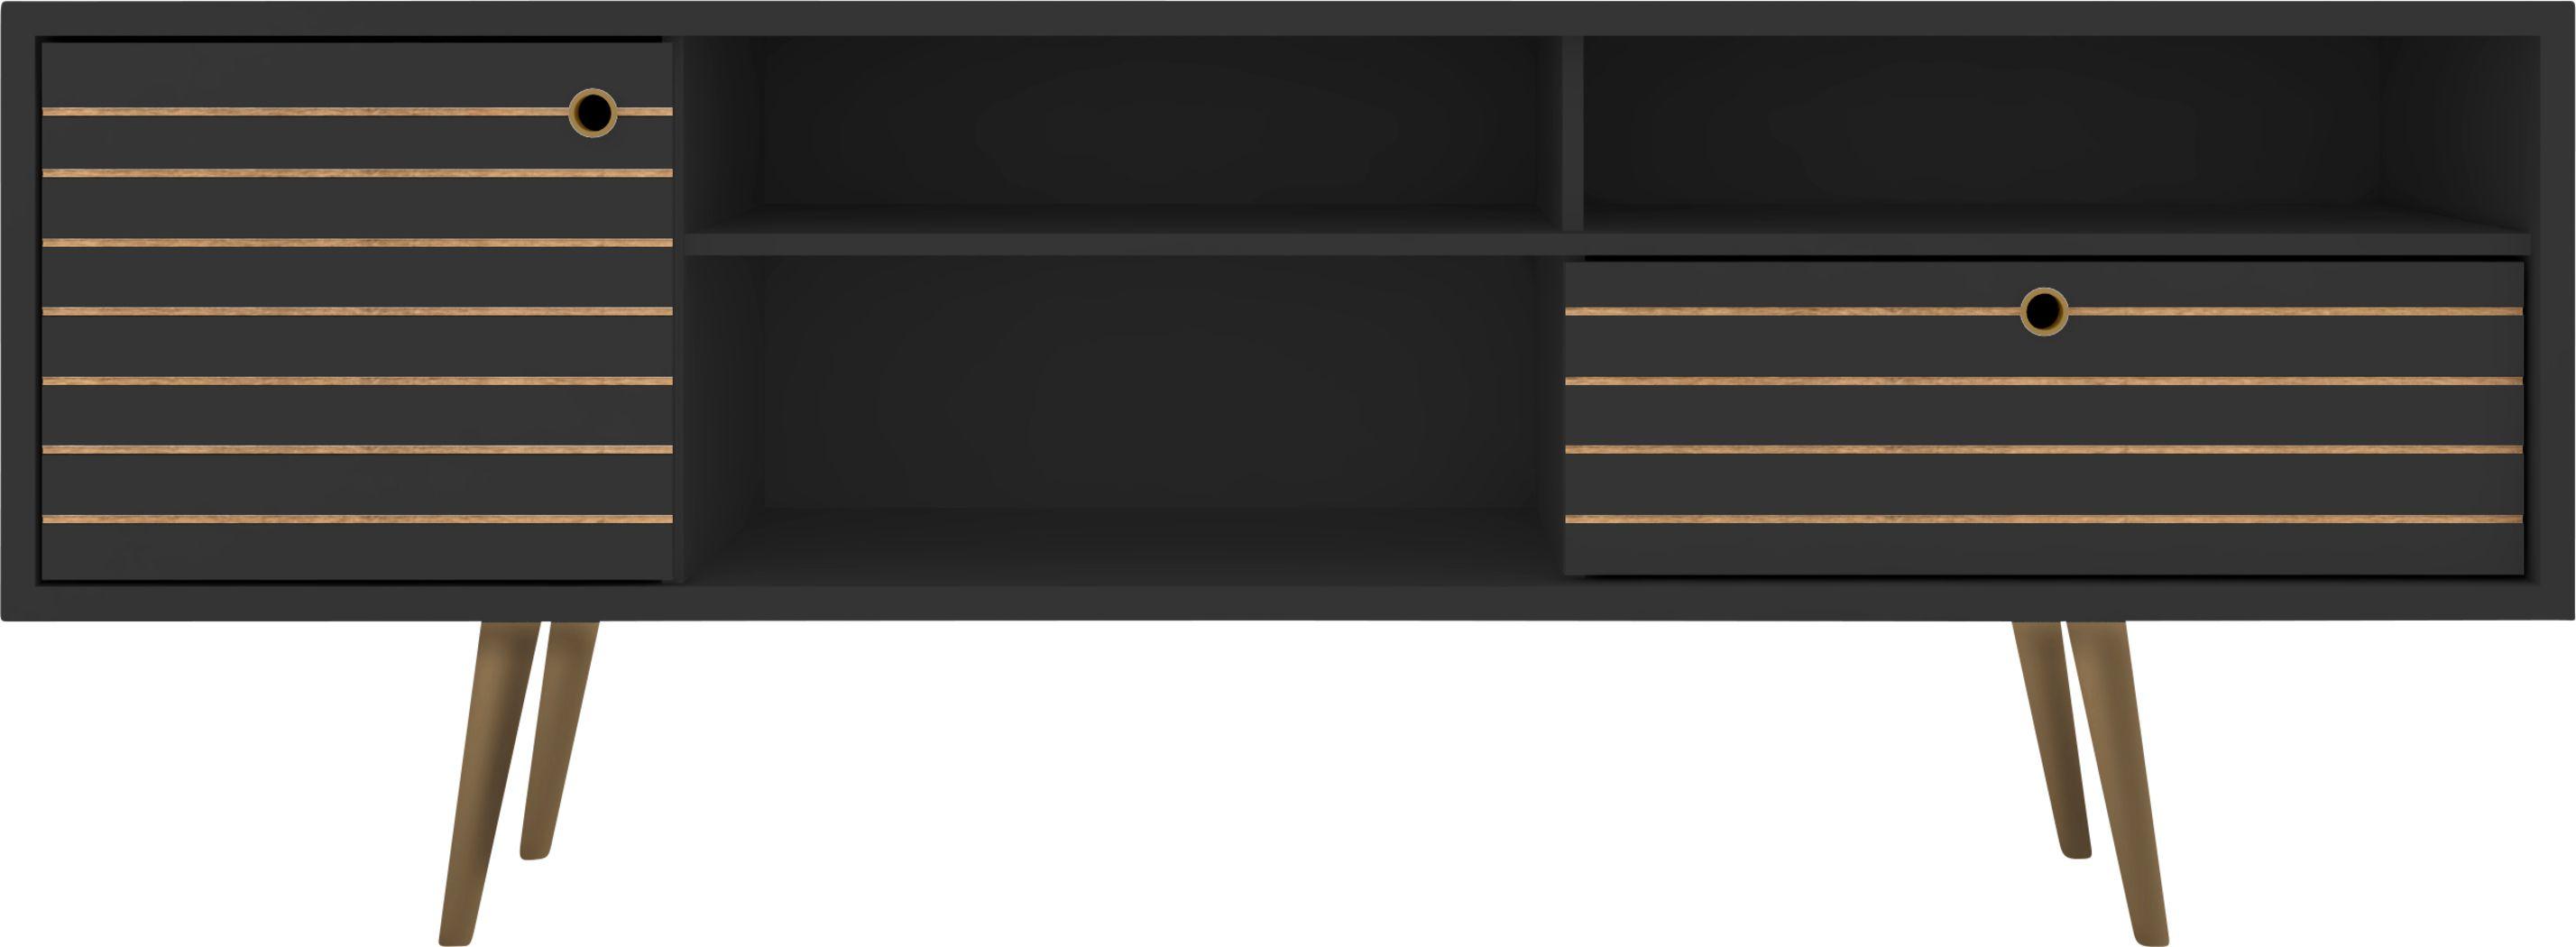 Vallar Black 71 In. Console